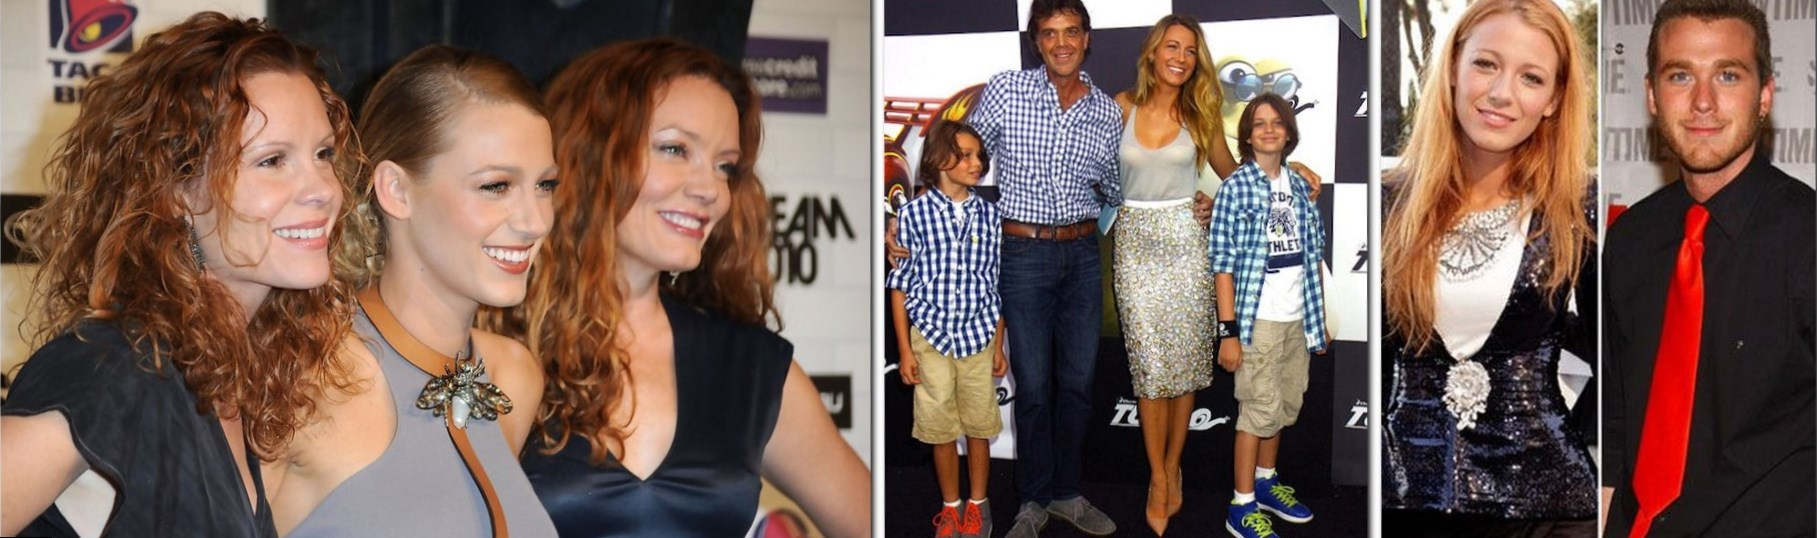 Blake Lively family: siblings, parents, children, husband